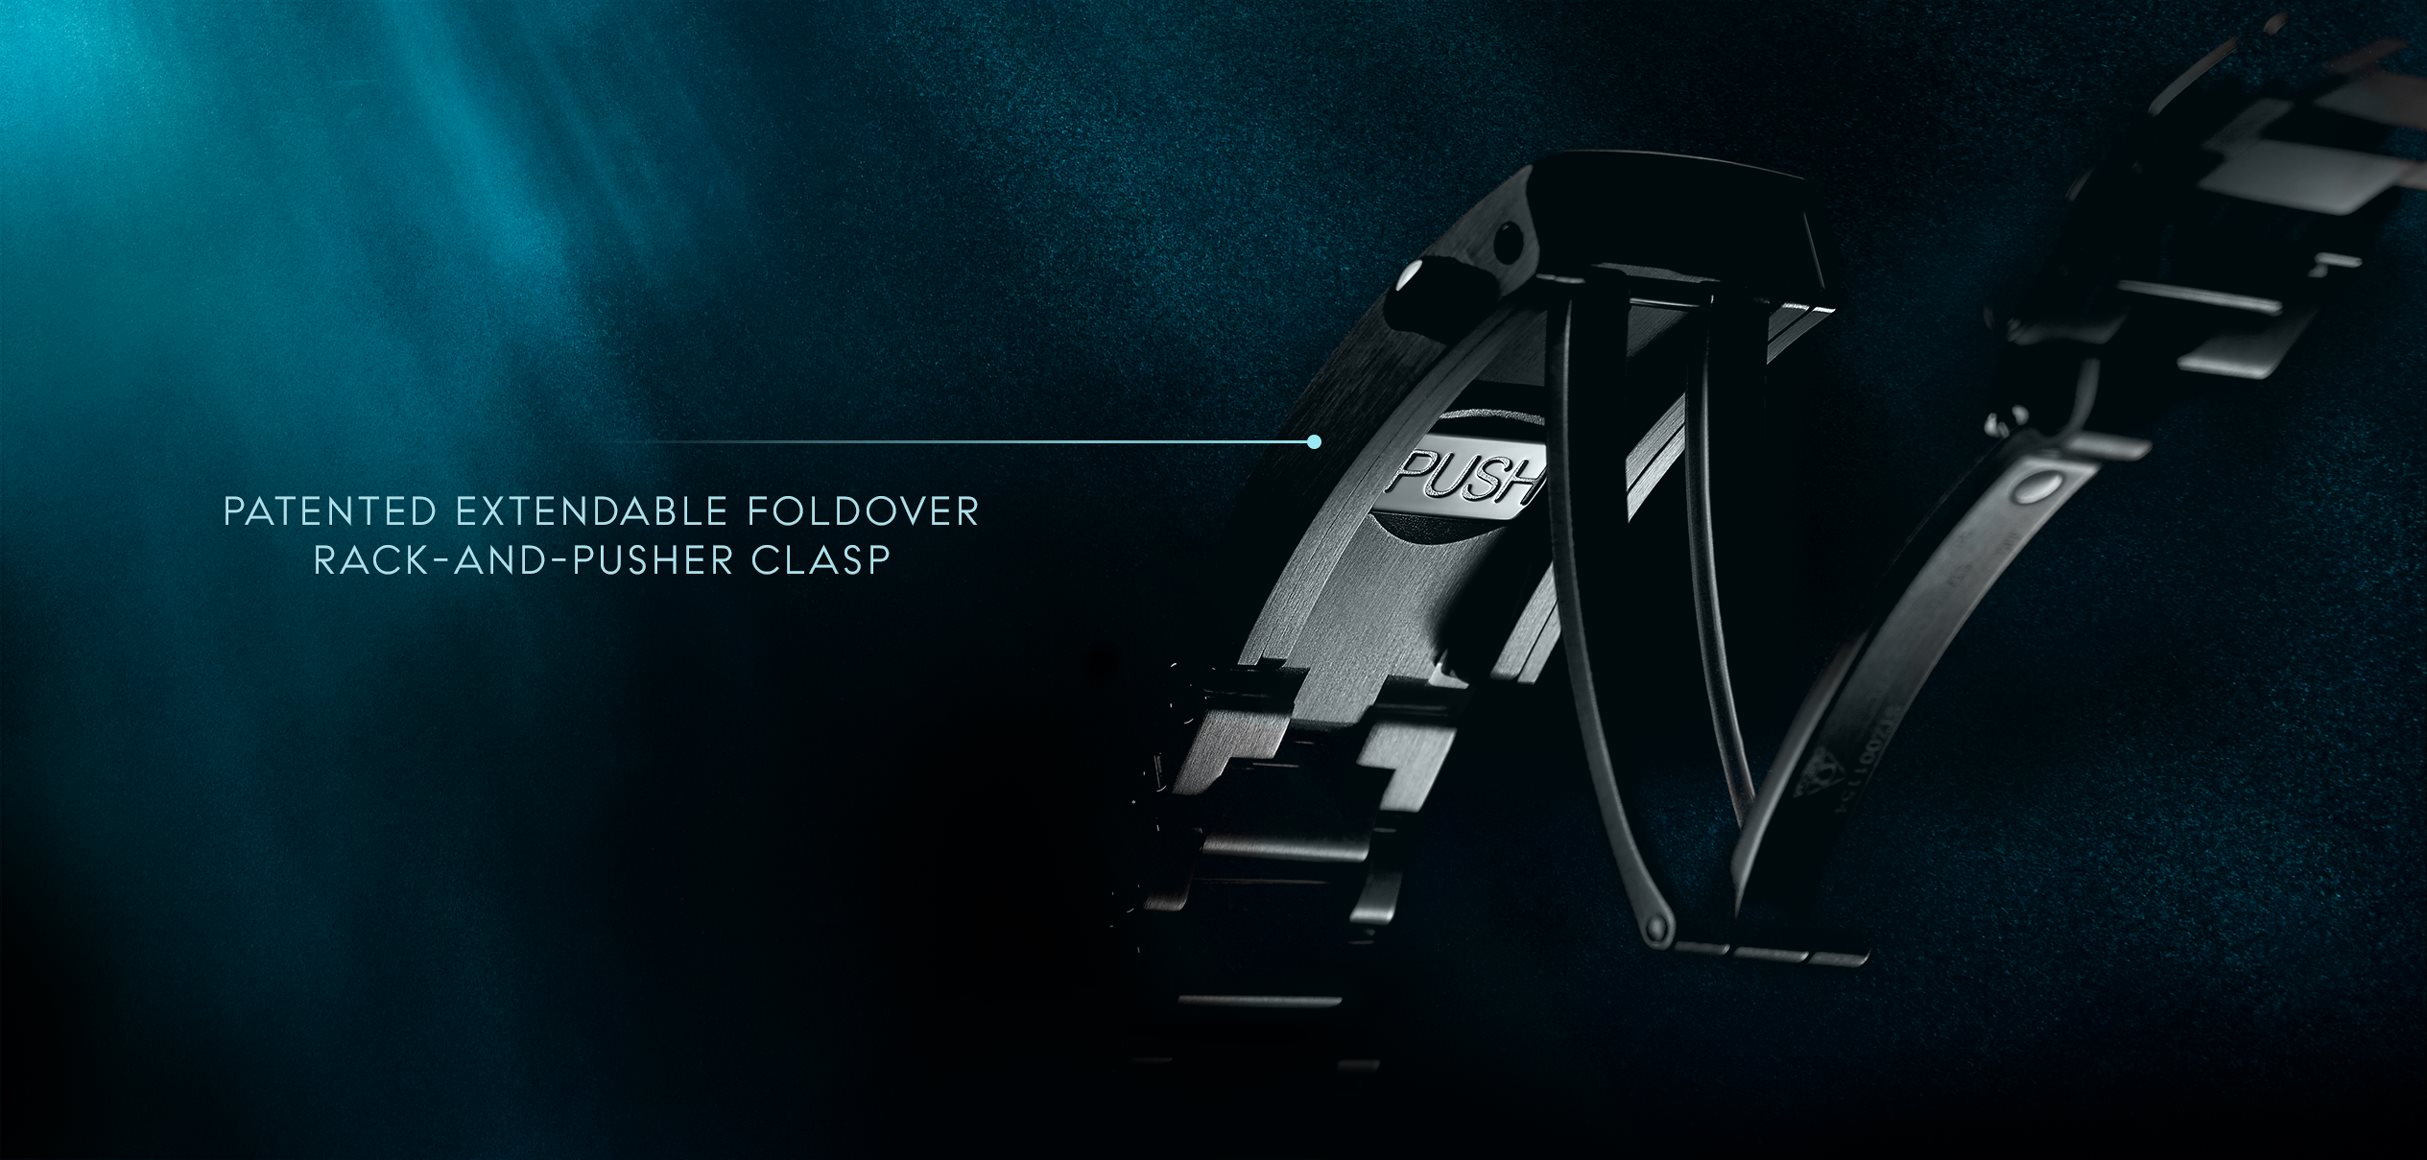 Omega Seamaster CK2913 Reissue BaselWorld 2014 Ace Jewelers (1)